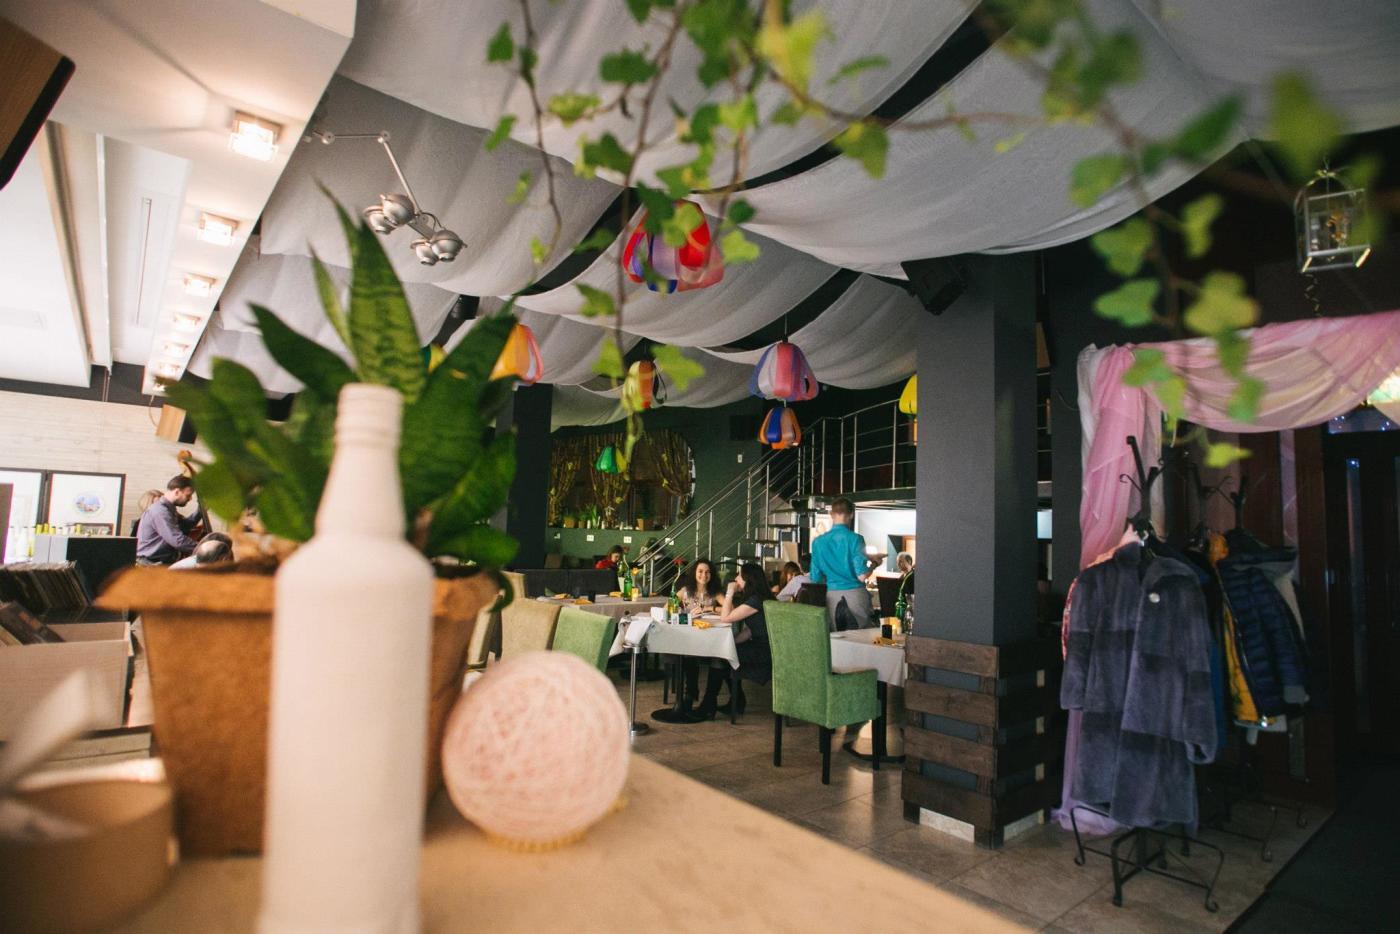 Кафе Гарден в Зеленограде (Garden) фото 42